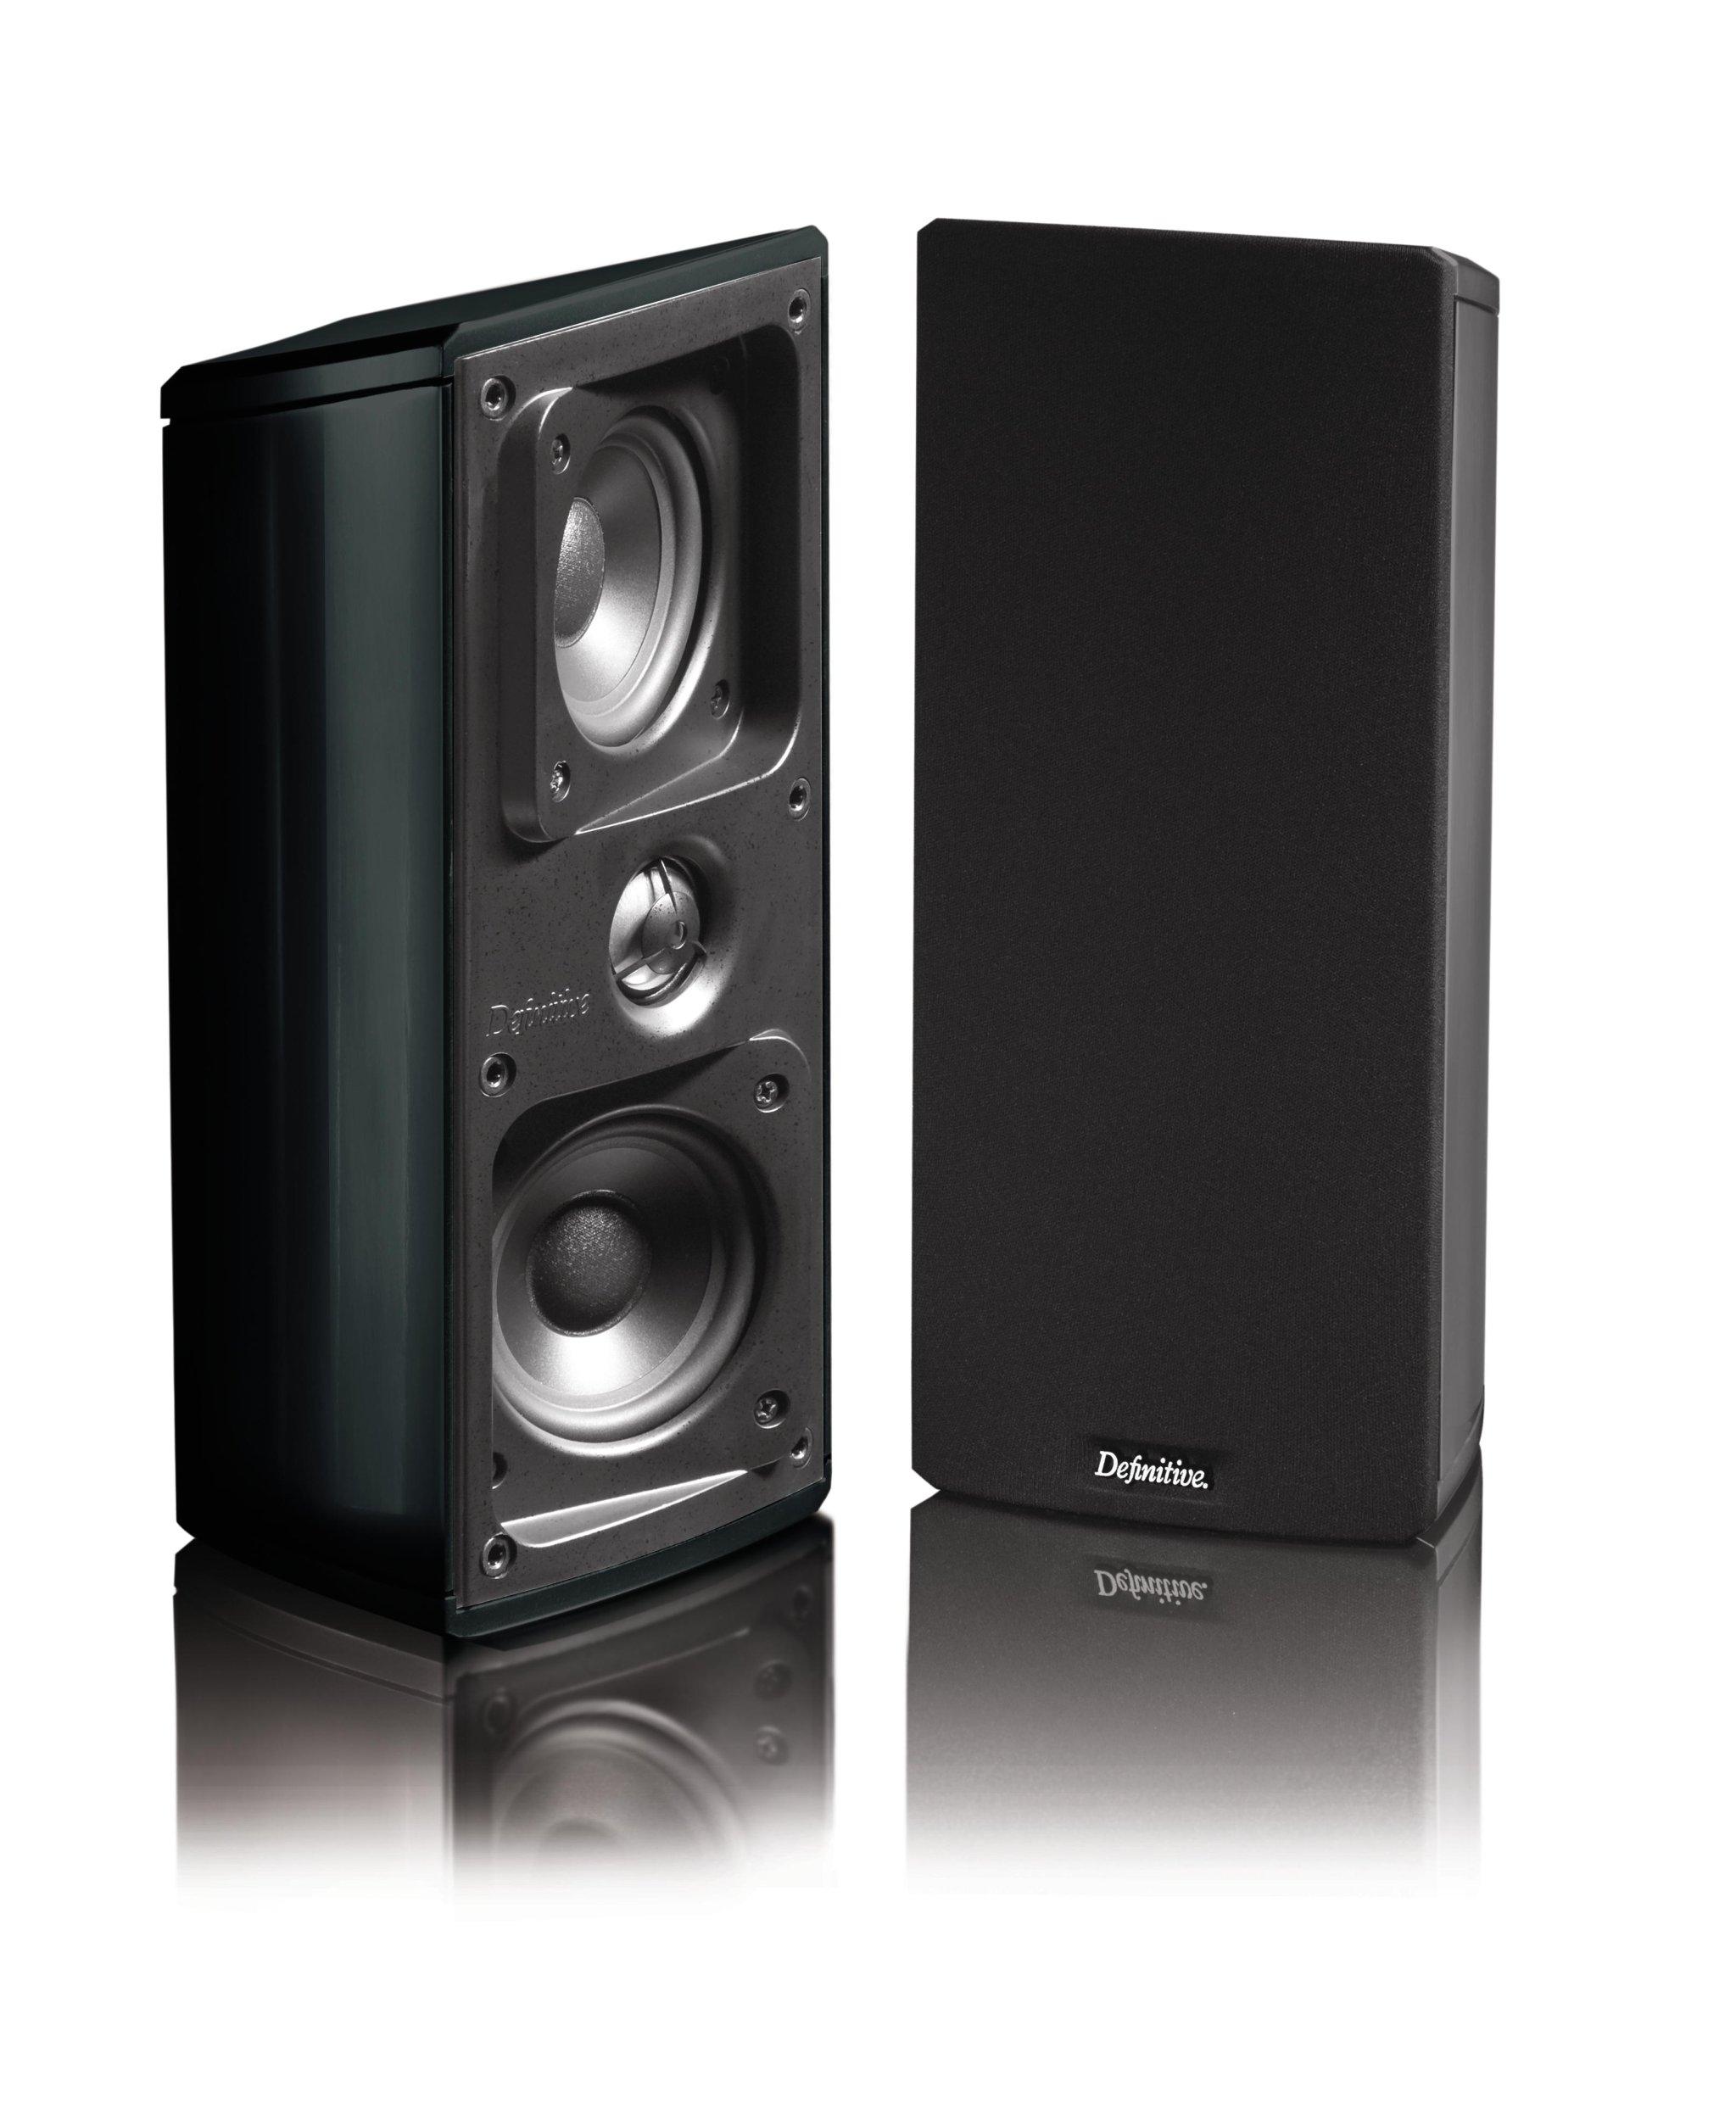 Best Floor Standing Speakers Under 1000 Pounds Best Rated In Satellite Speakers Helpful Customer Reviews Amazon Com